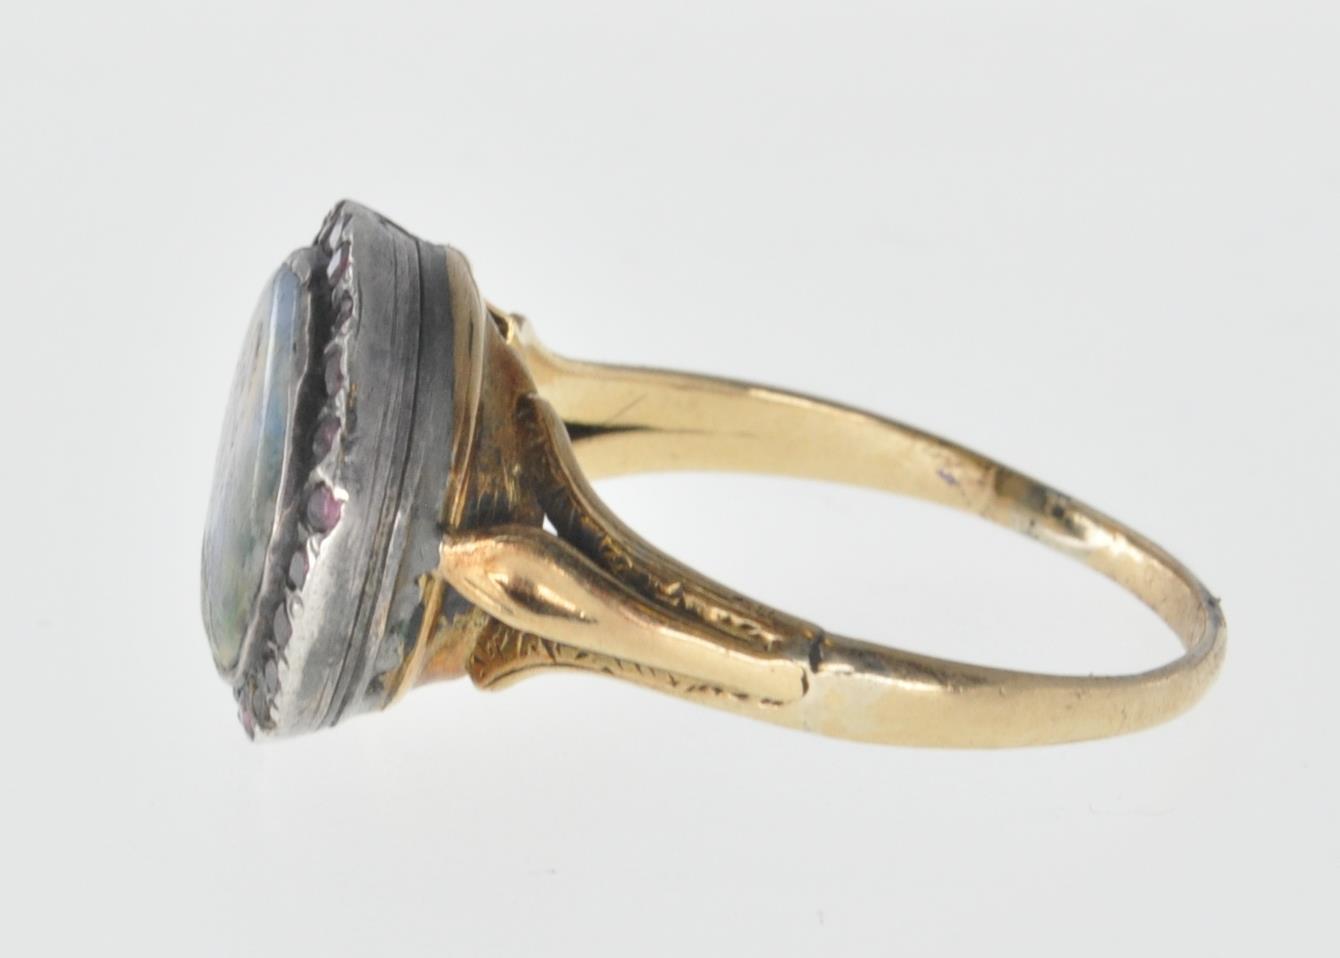 ANTIQUE MINIATURE PORTRAIT PANEL RING - Image 3 of 7